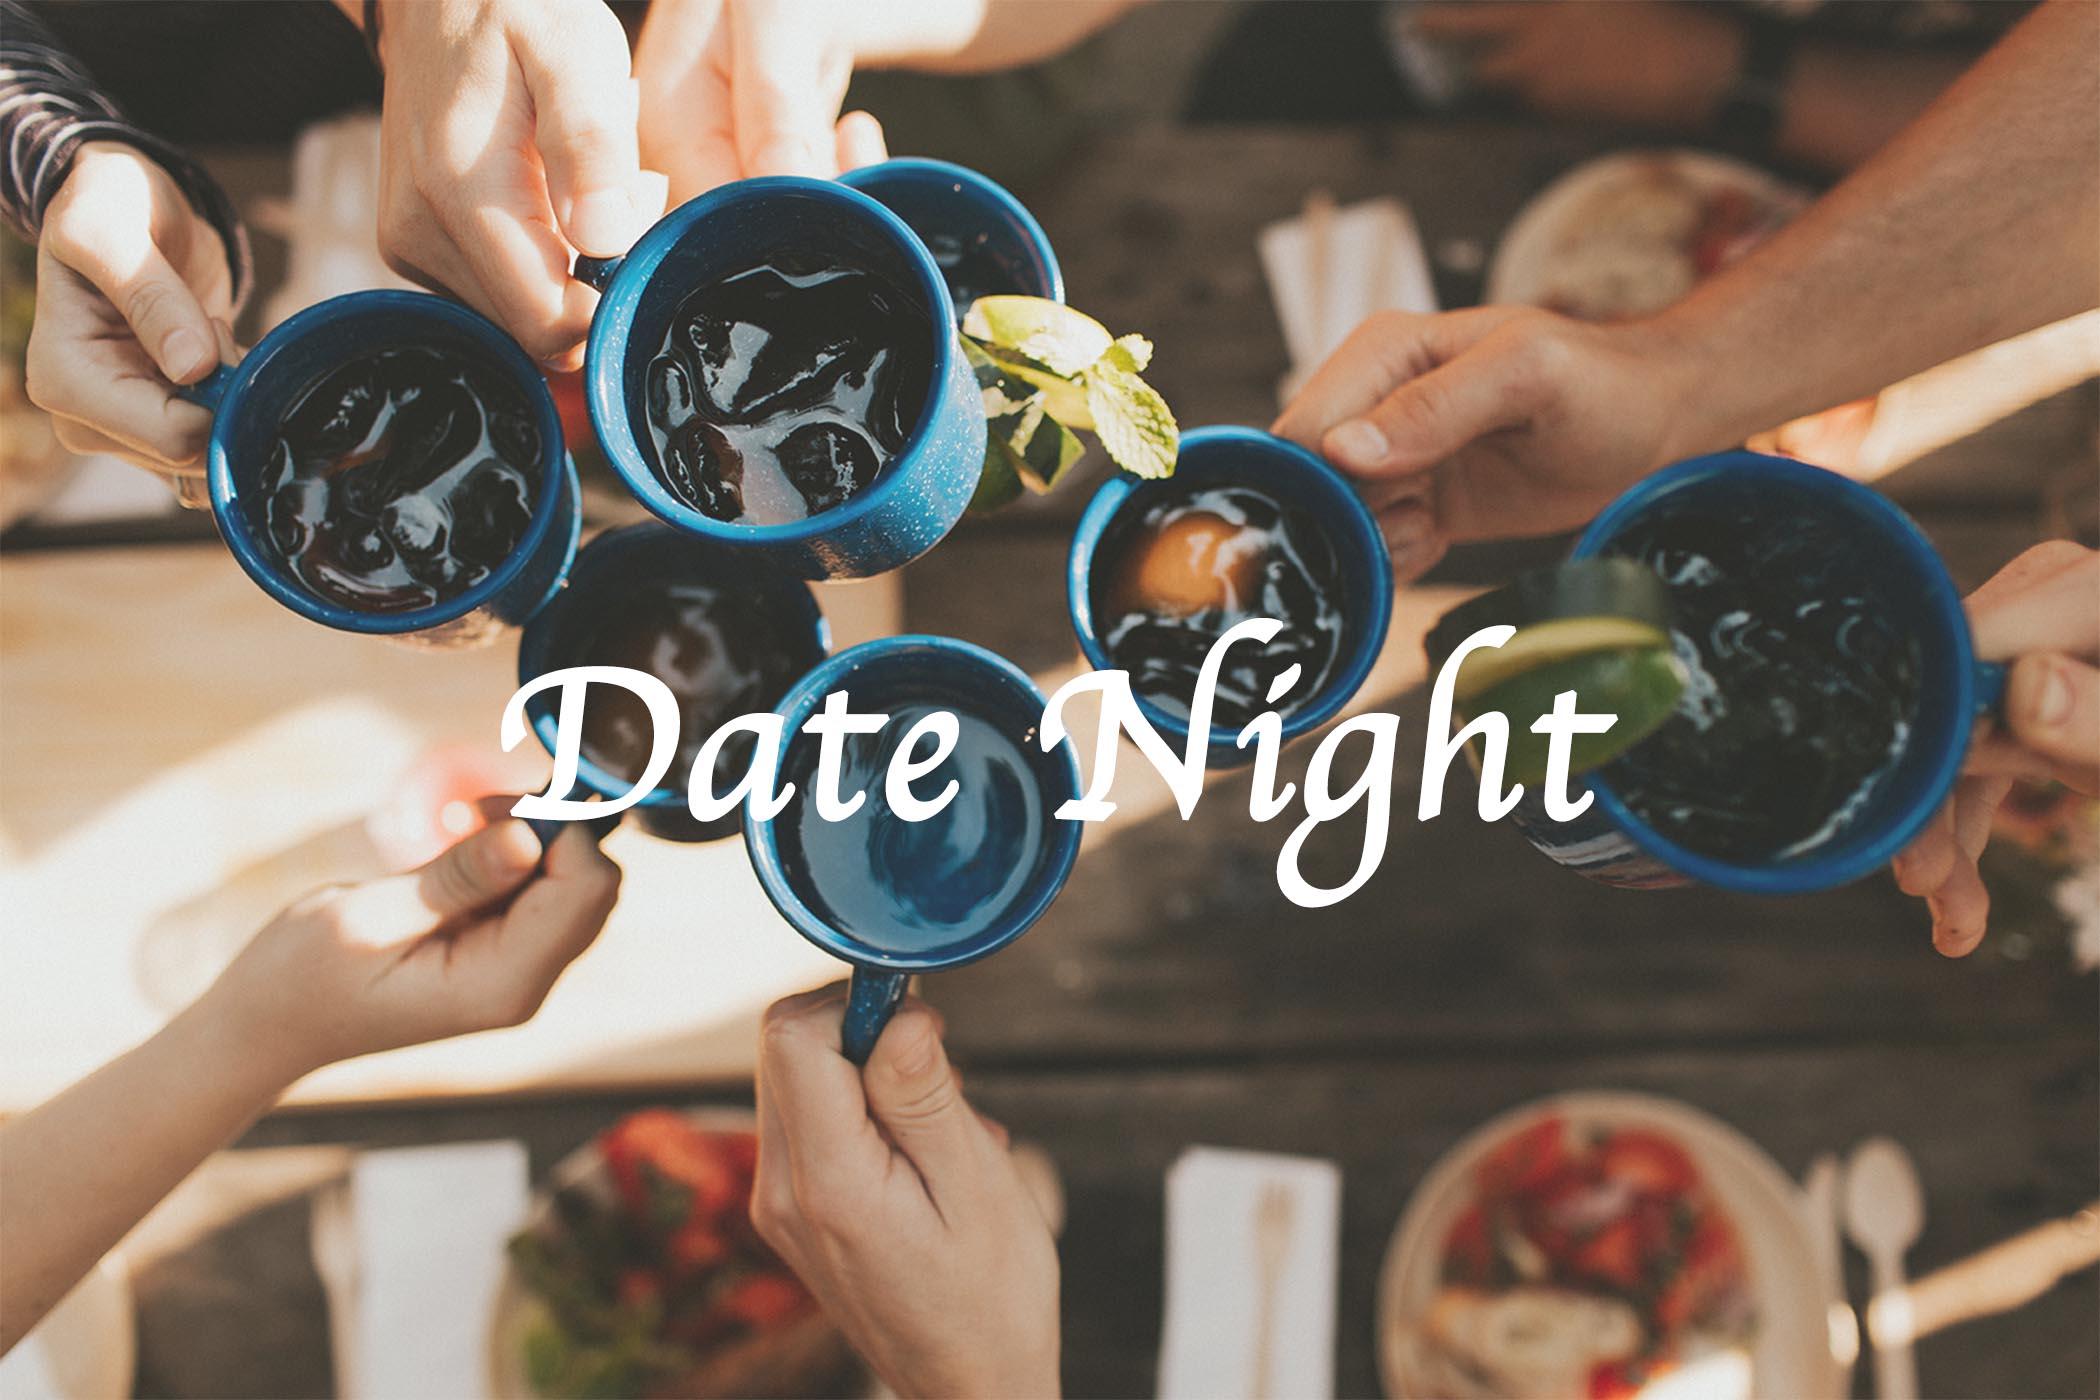 datenight.jpg